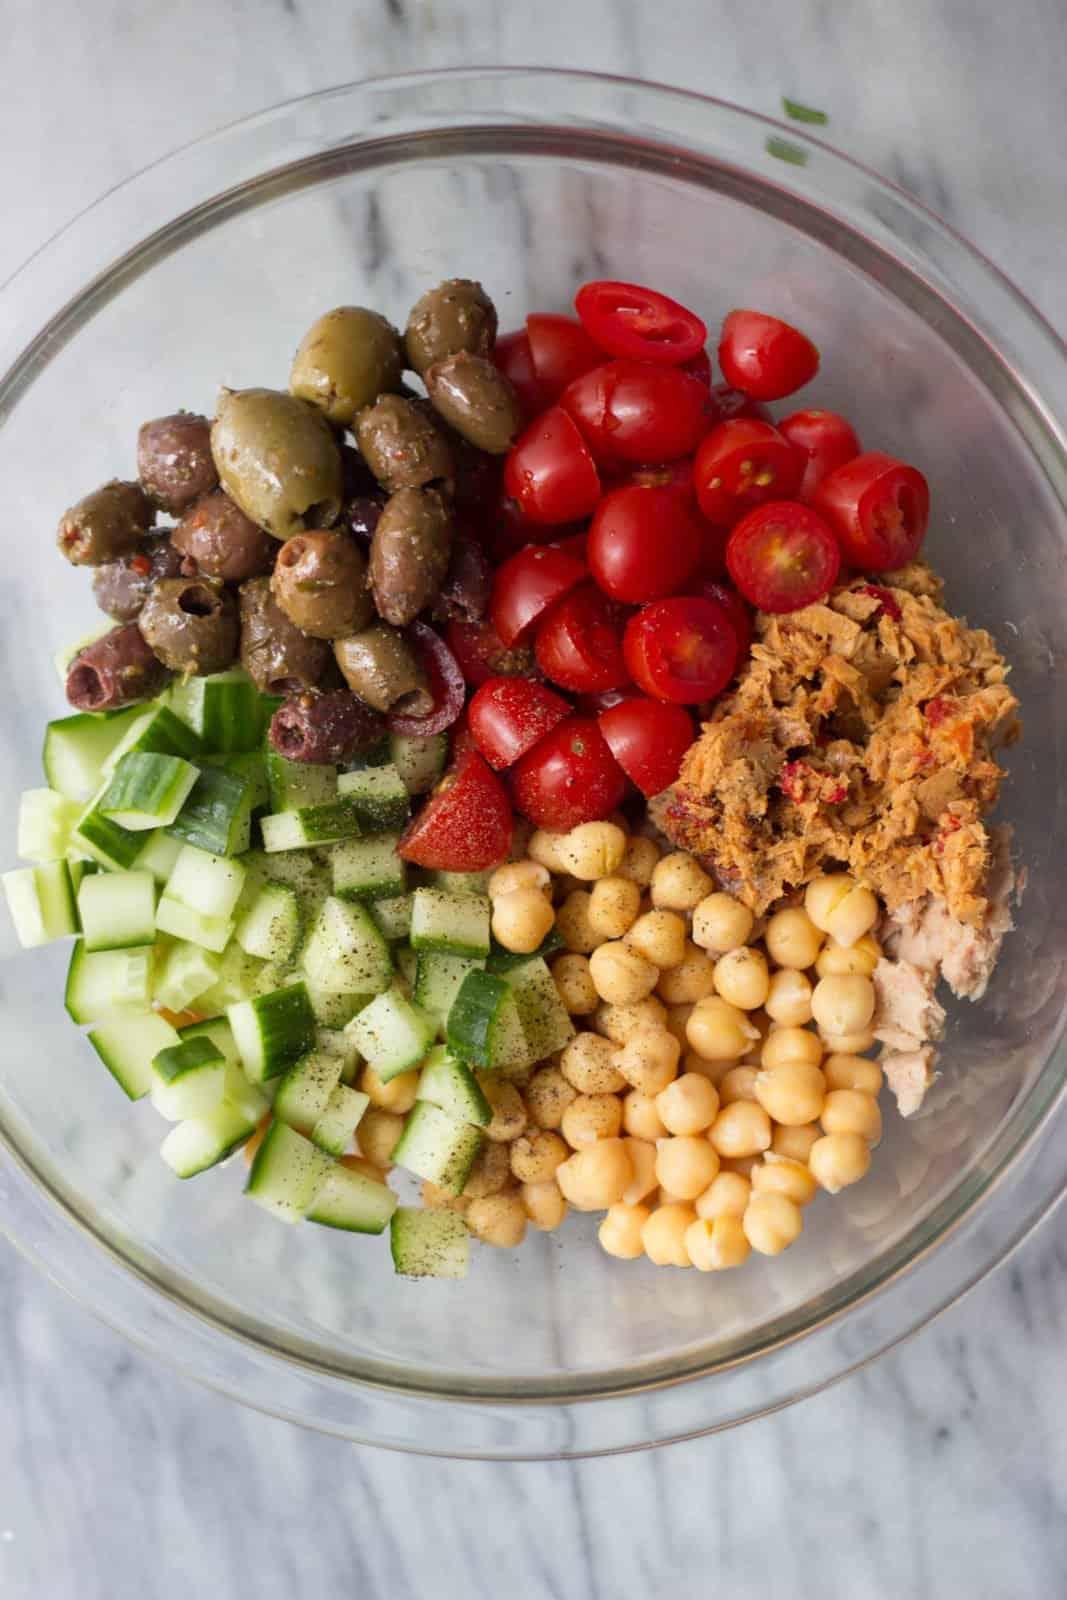 Mediterranean salad in a clear bowl.